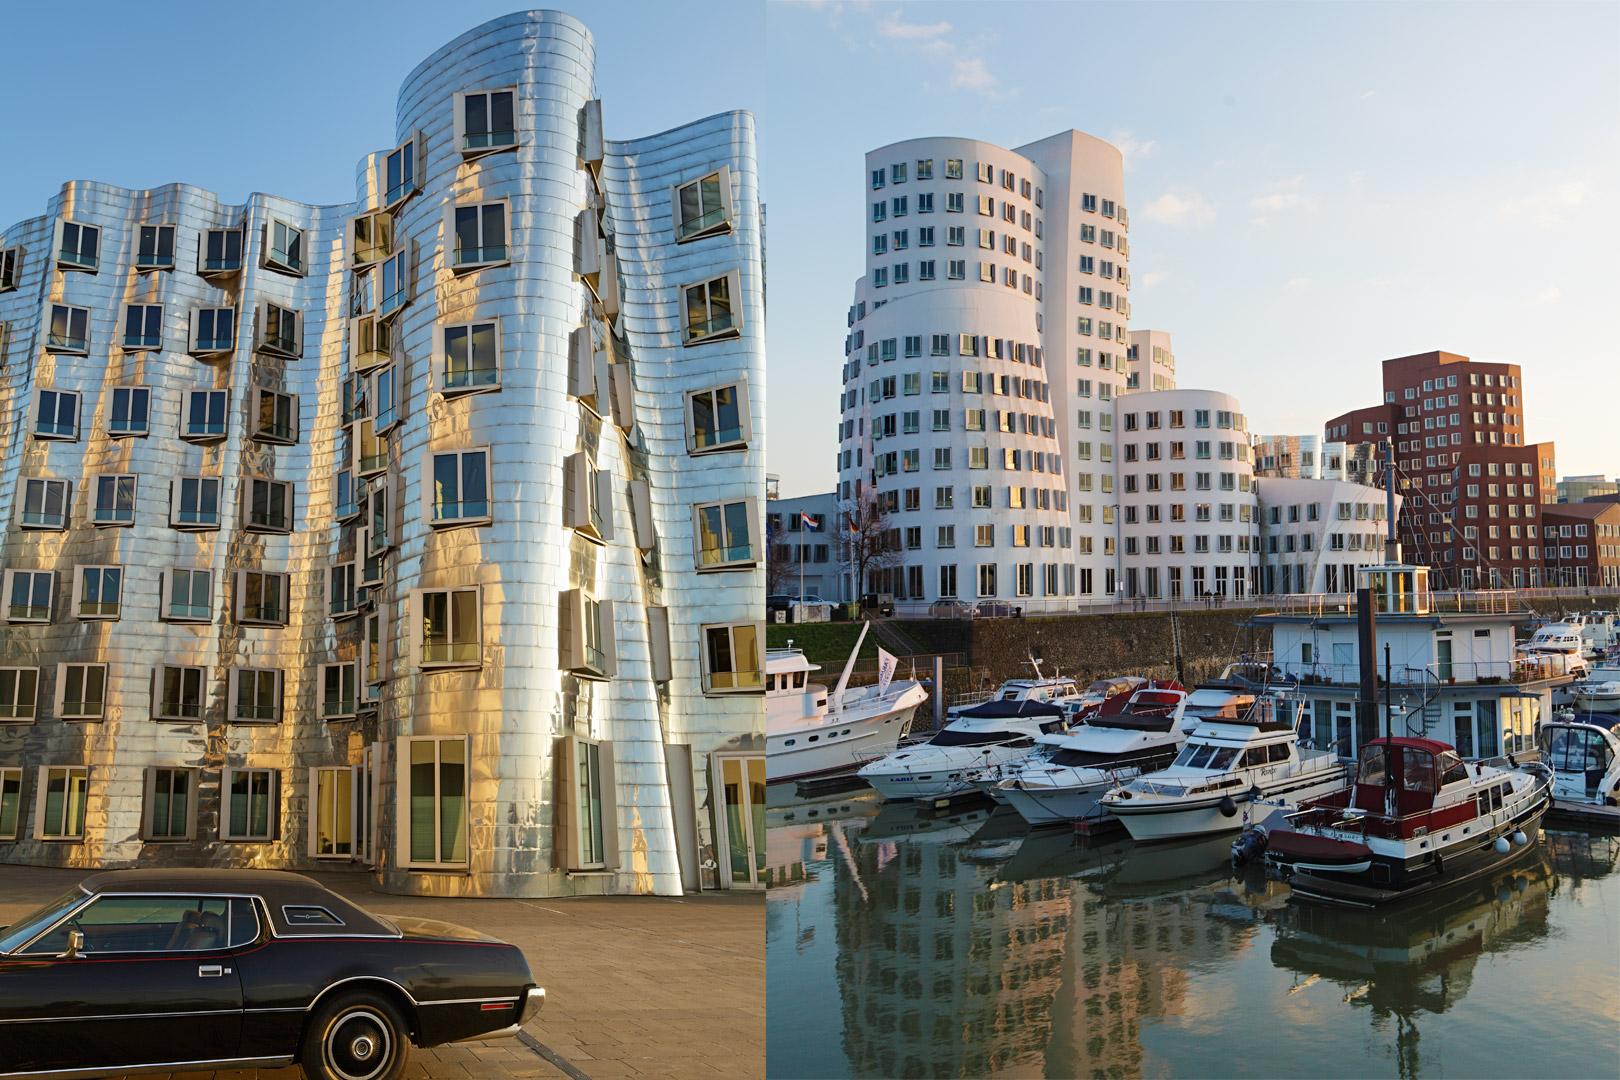 Medienhafen, Frank O. Gehry, Düsseldorf, Merian Magazin